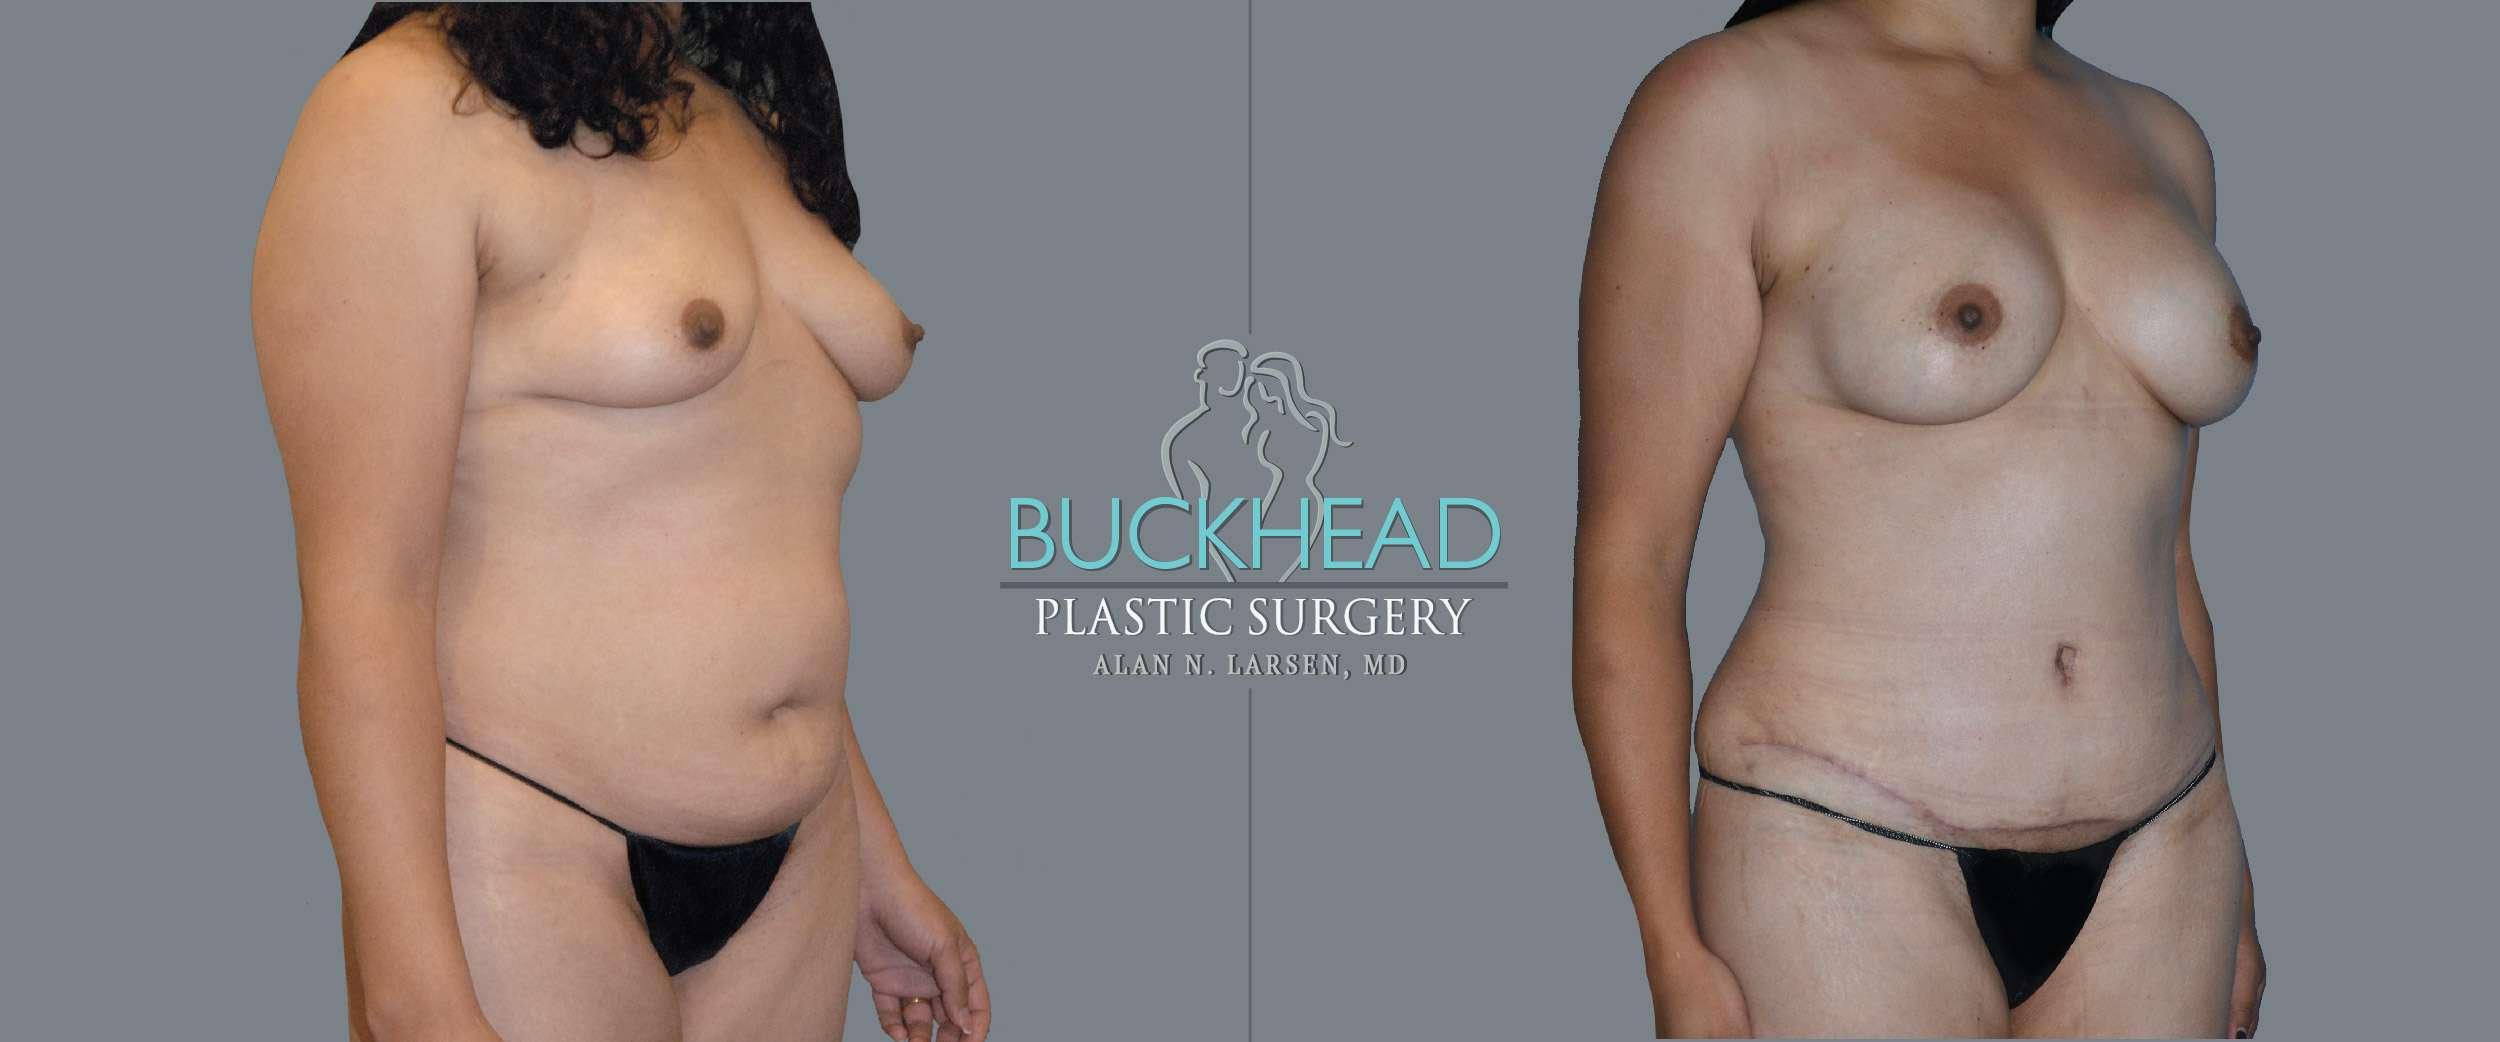 Before and After Photo Gallery | Liposuction - Hips & Flanks | Buckhead Plastic Surgery | Alan N. Larsen, MD | Board-Certified Plastic Surgeon | Atlanta GA